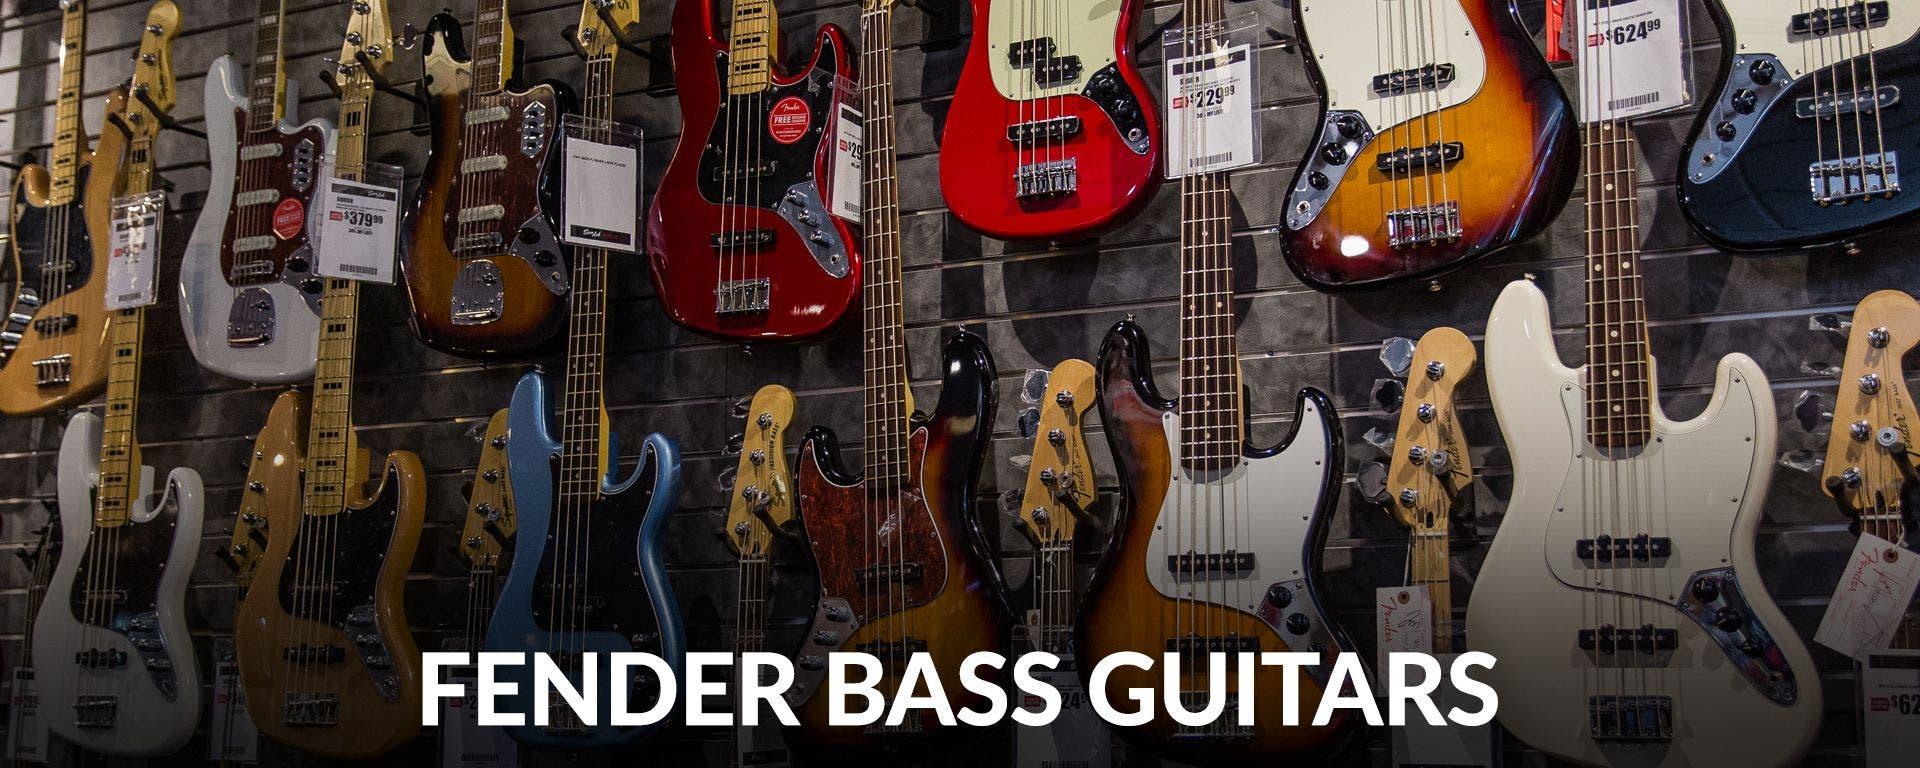 Fender Bass Guitars at Sam Ash